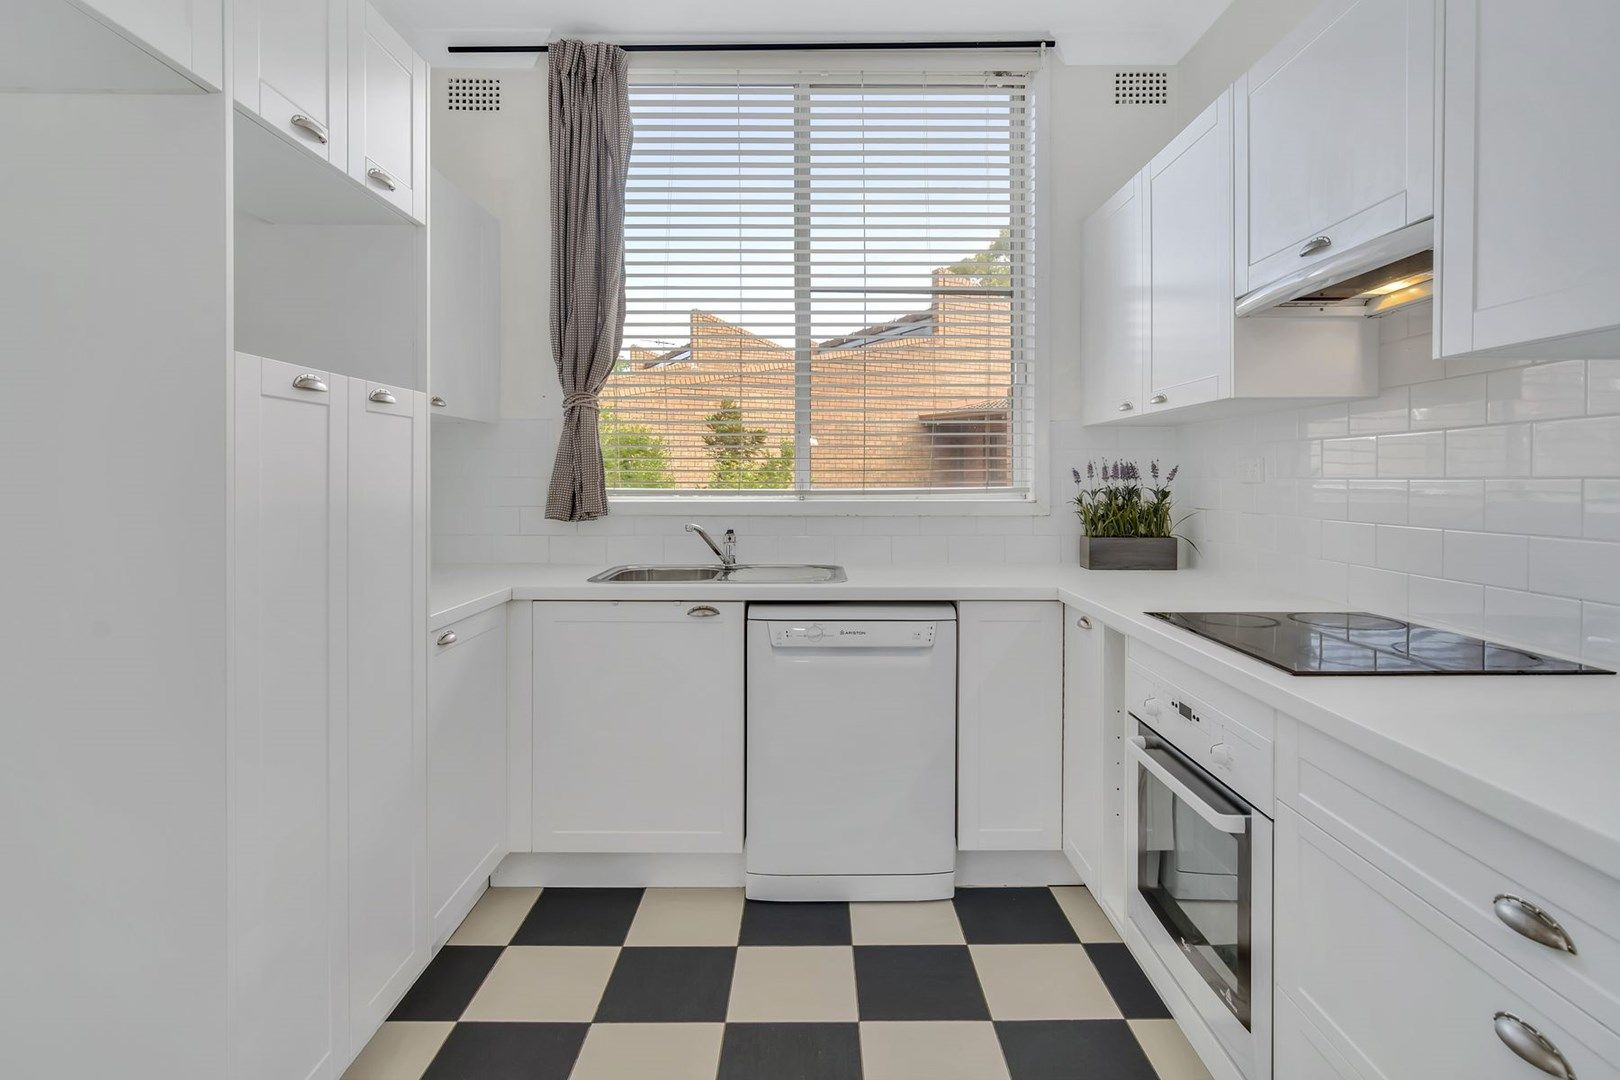 3/12 Matthew Street, Hunters Hill NSW 2110, Image 1